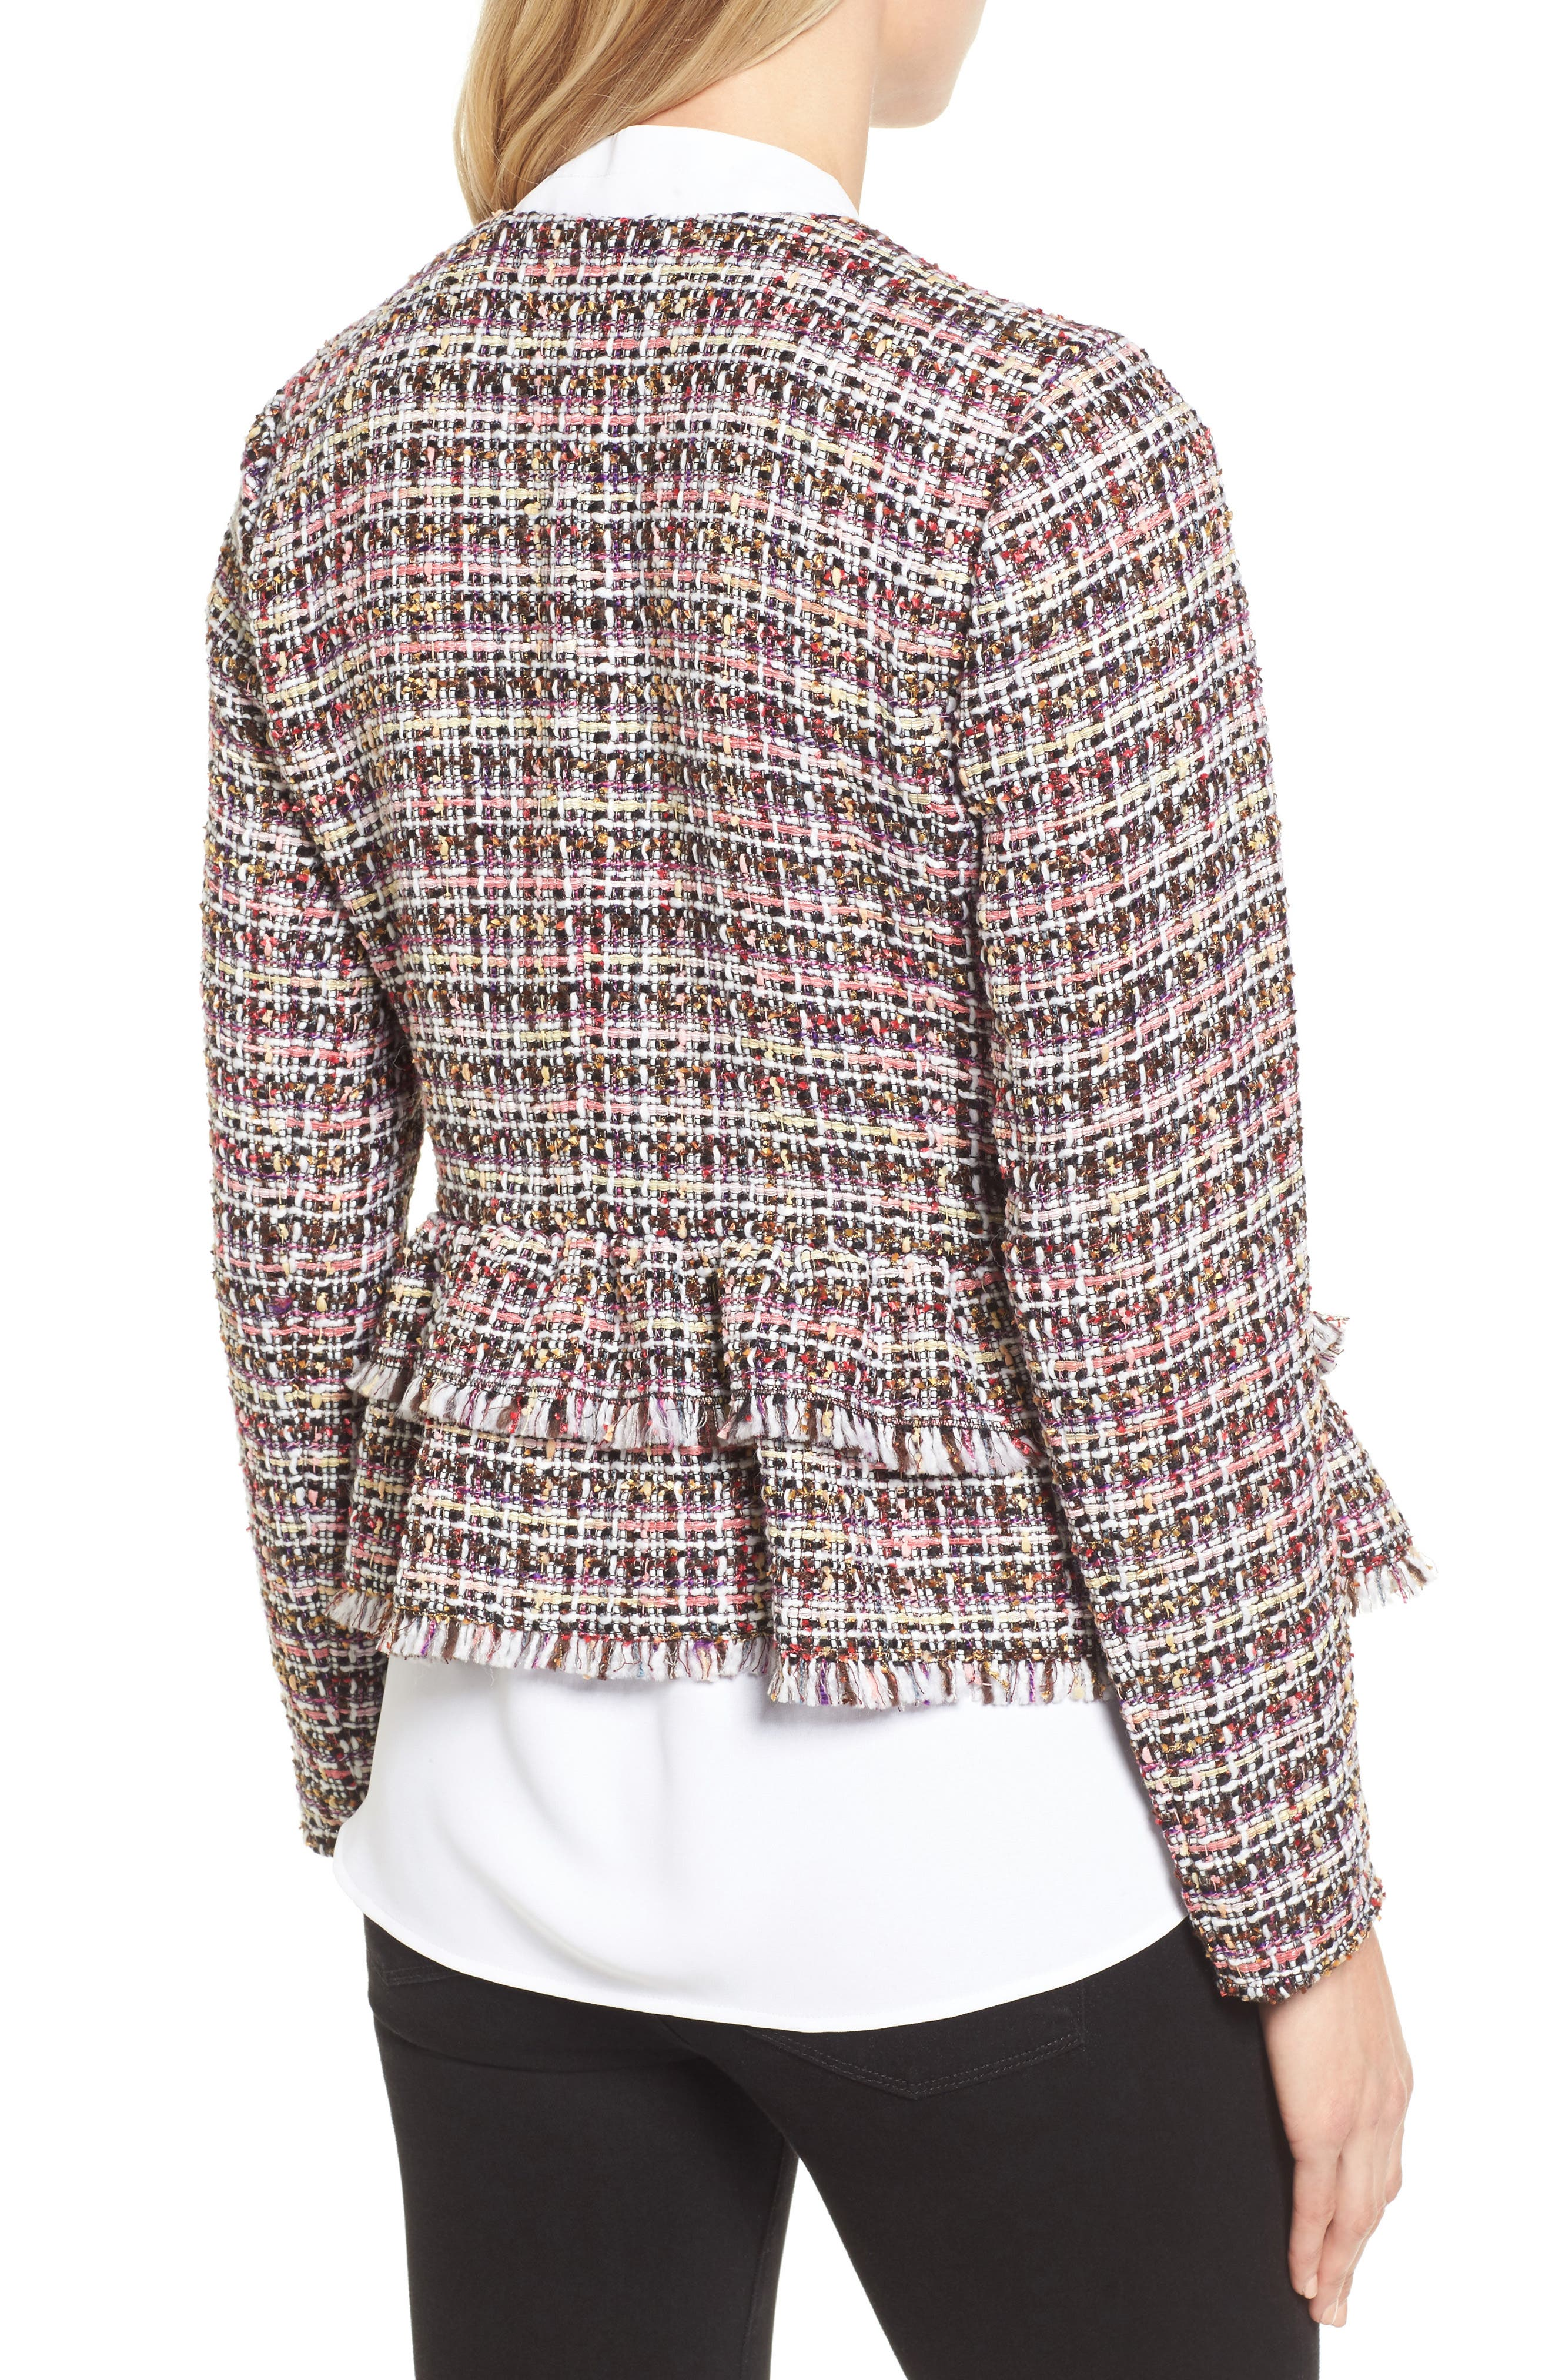 Ruffle Detail Tweed Jacket,                             Alternate thumbnail 2, color,                             660